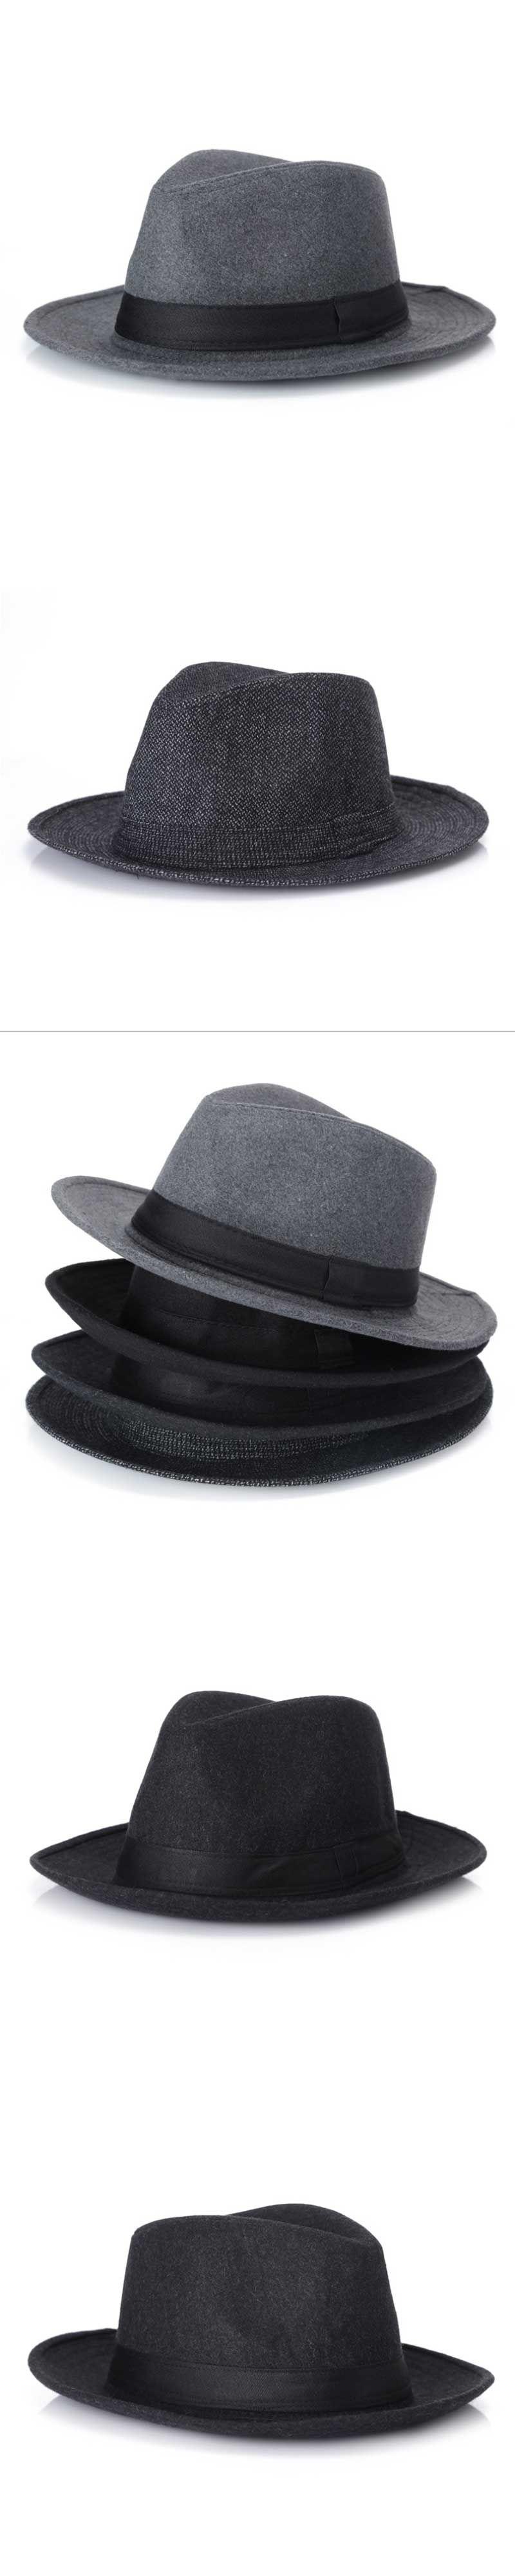 New Fashion Wool men Black Fedora Hat For Women s Wool Wide Brim JazzChic  Cap Vintage Panama 11f66ea3f5e3